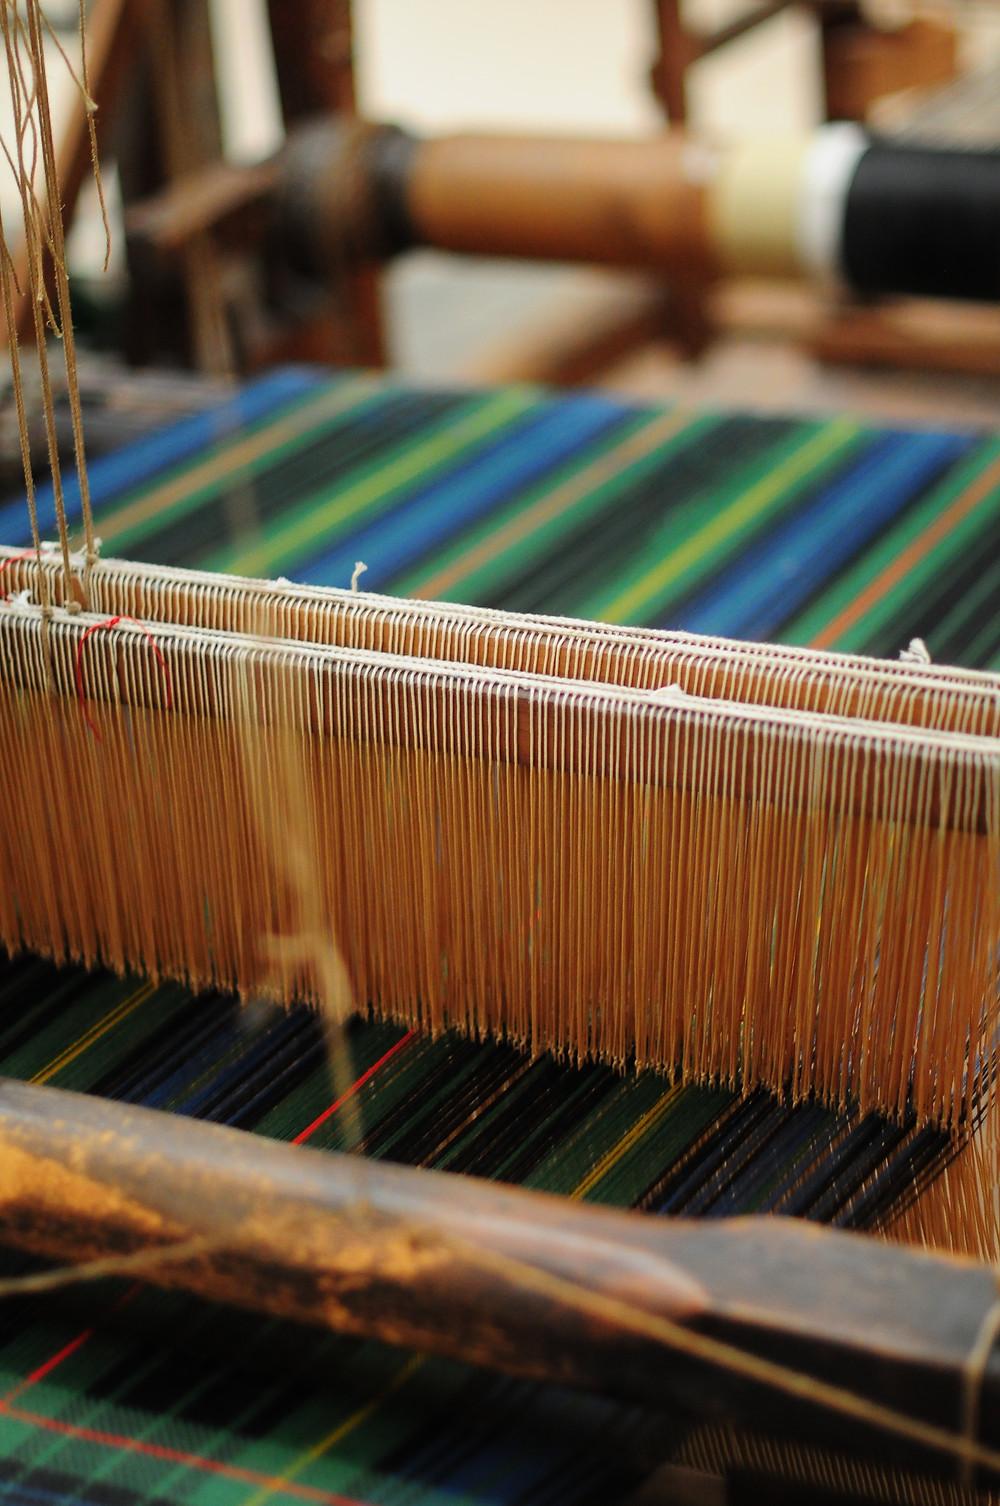 Tartan weaving machine